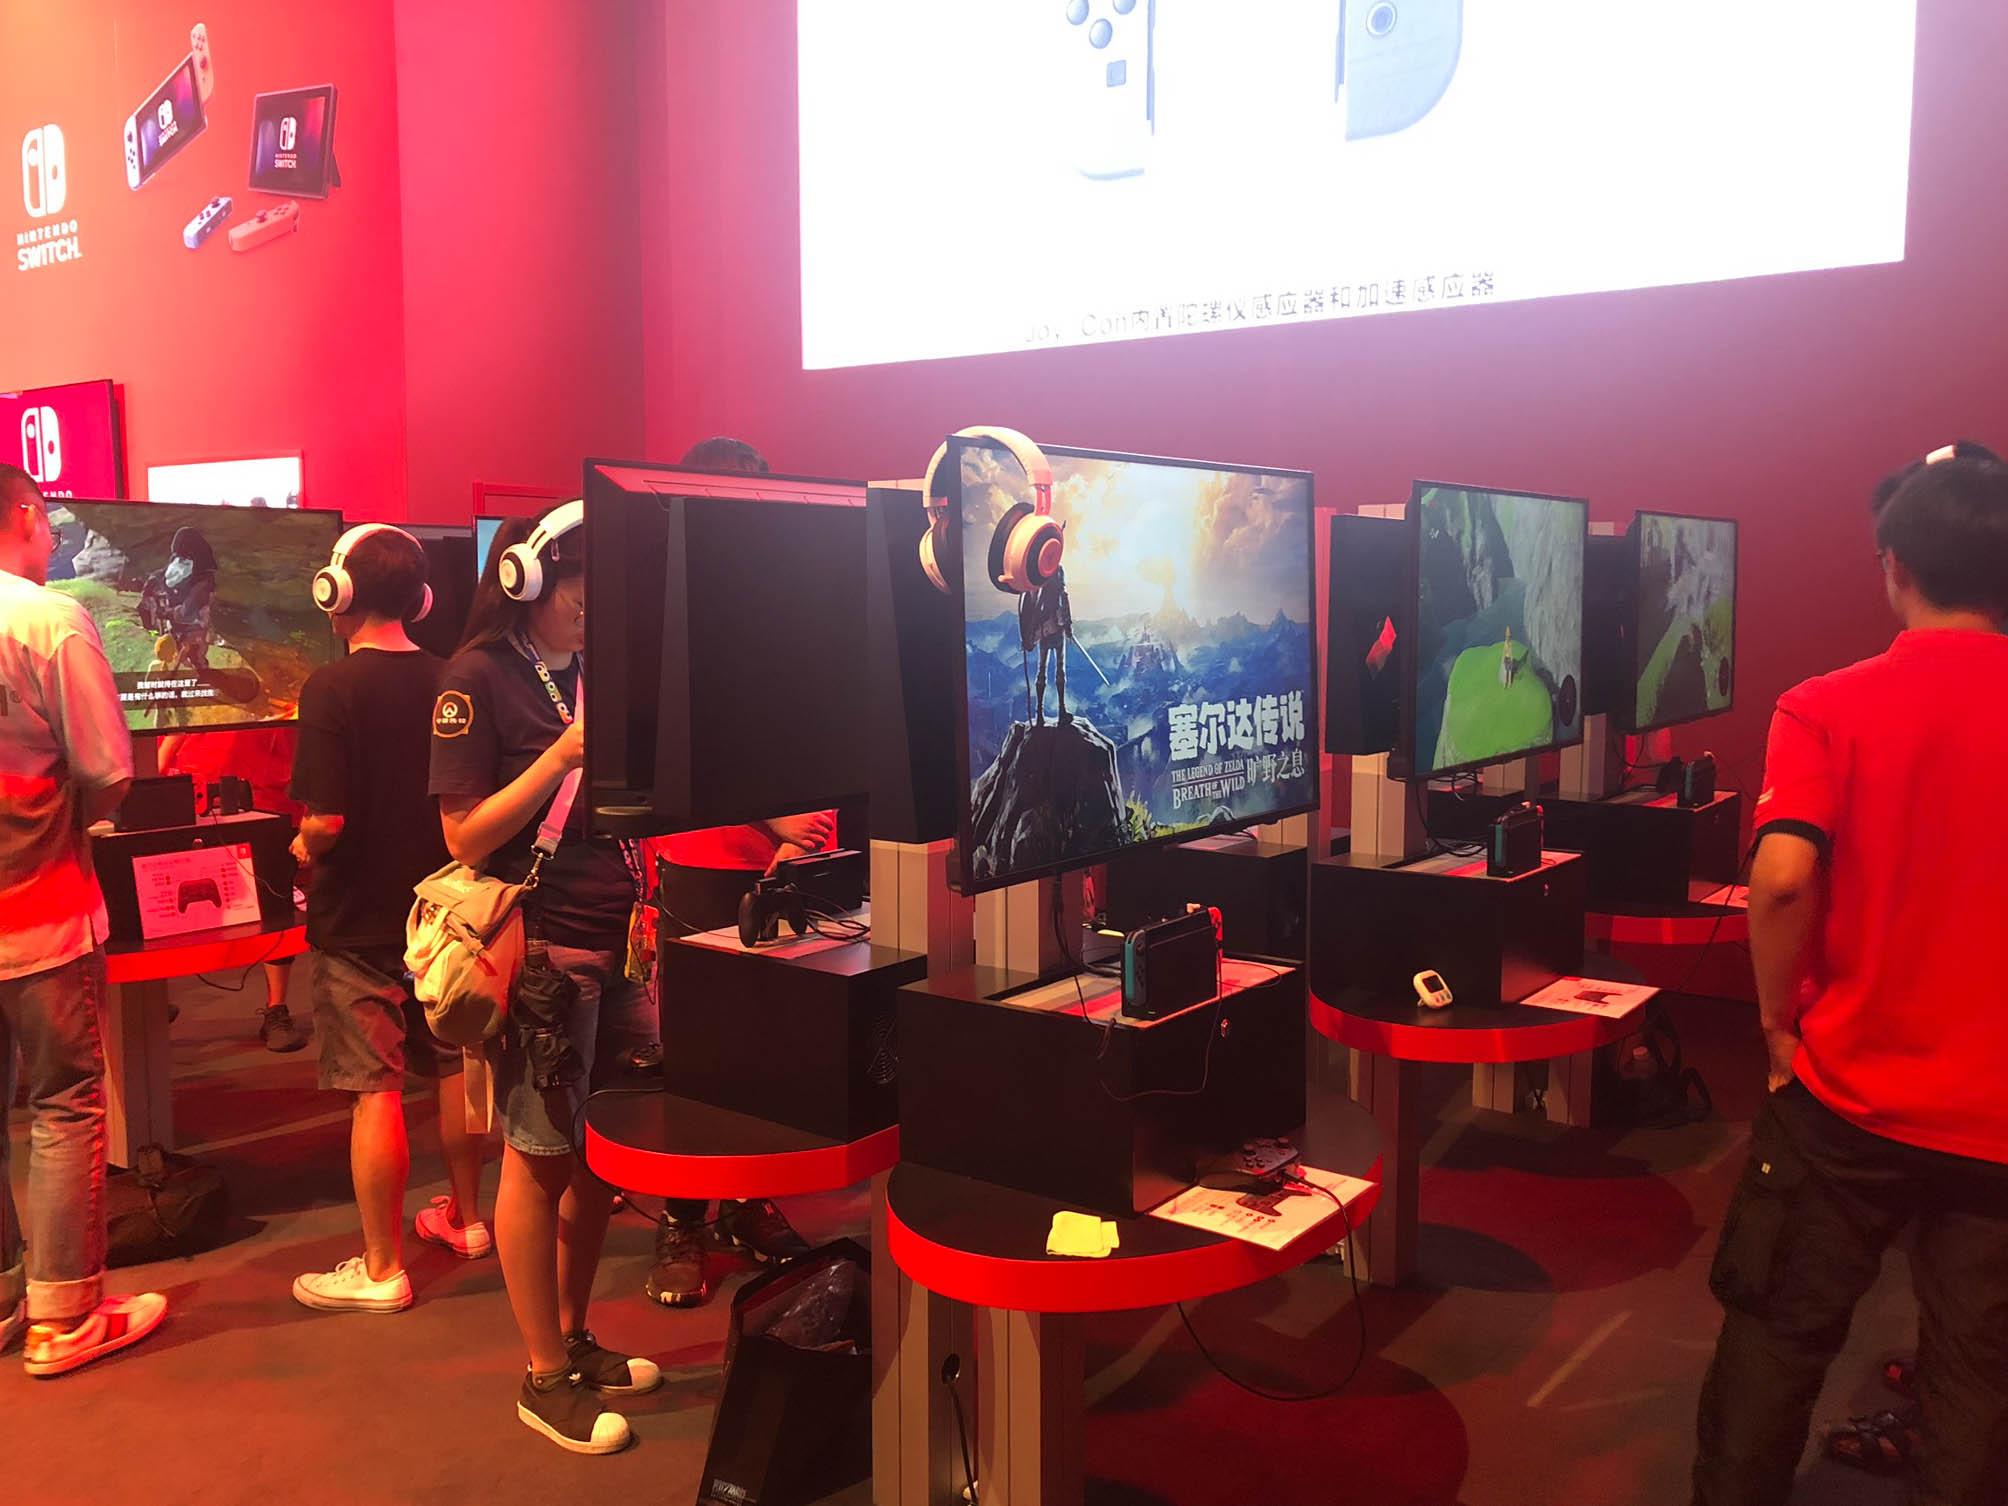 2019 ChinaJoy 中国国际数码互动娱乐展览会 游玩 第67张